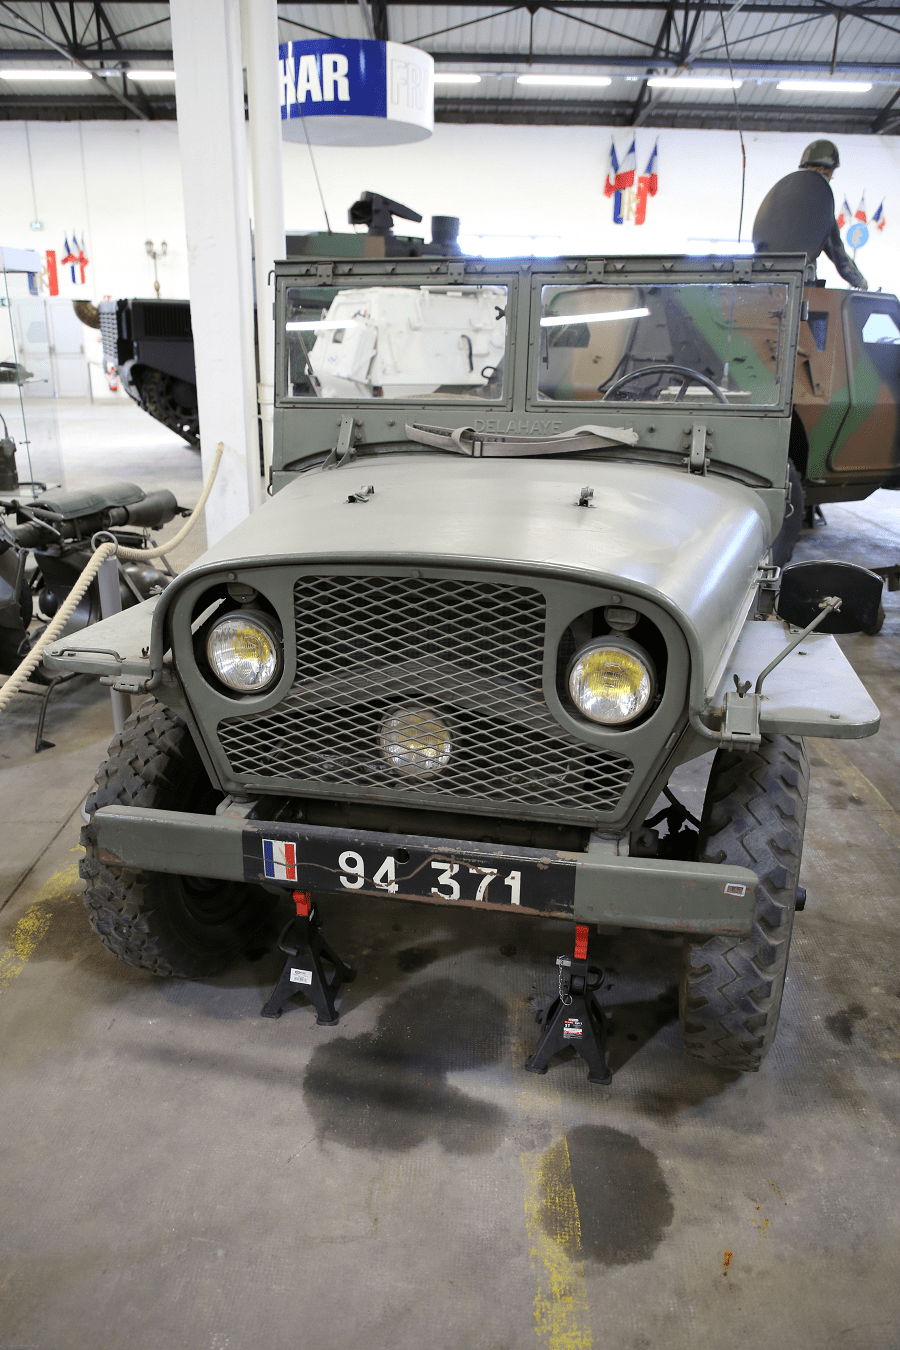 Delahaye VLR - французский армейский джип (модель 1951)